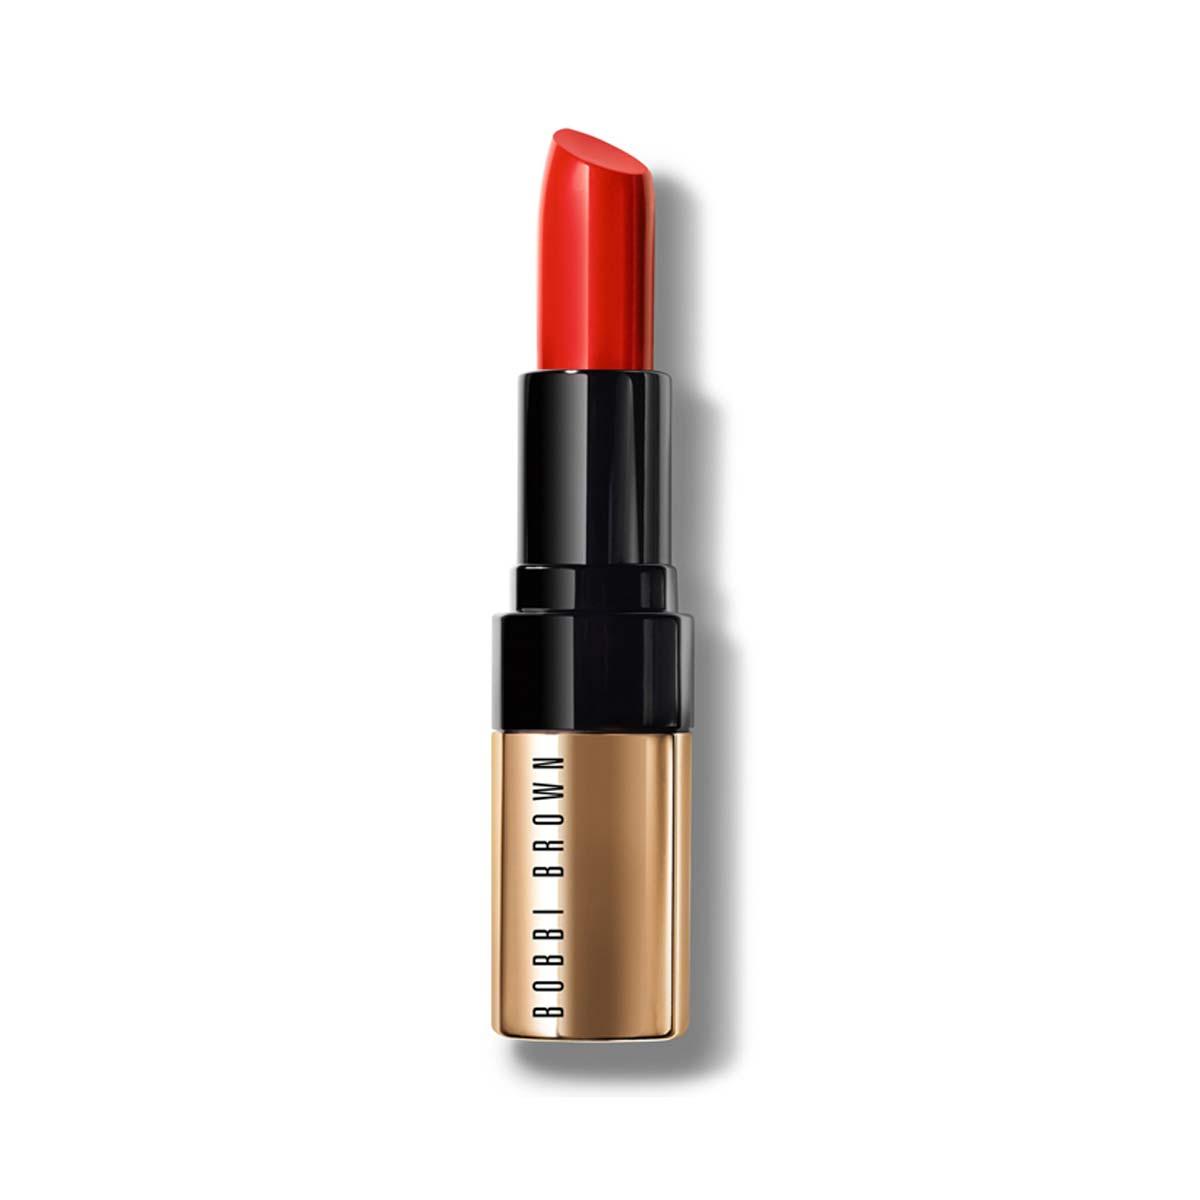 BOBBI BROWN Lipstick